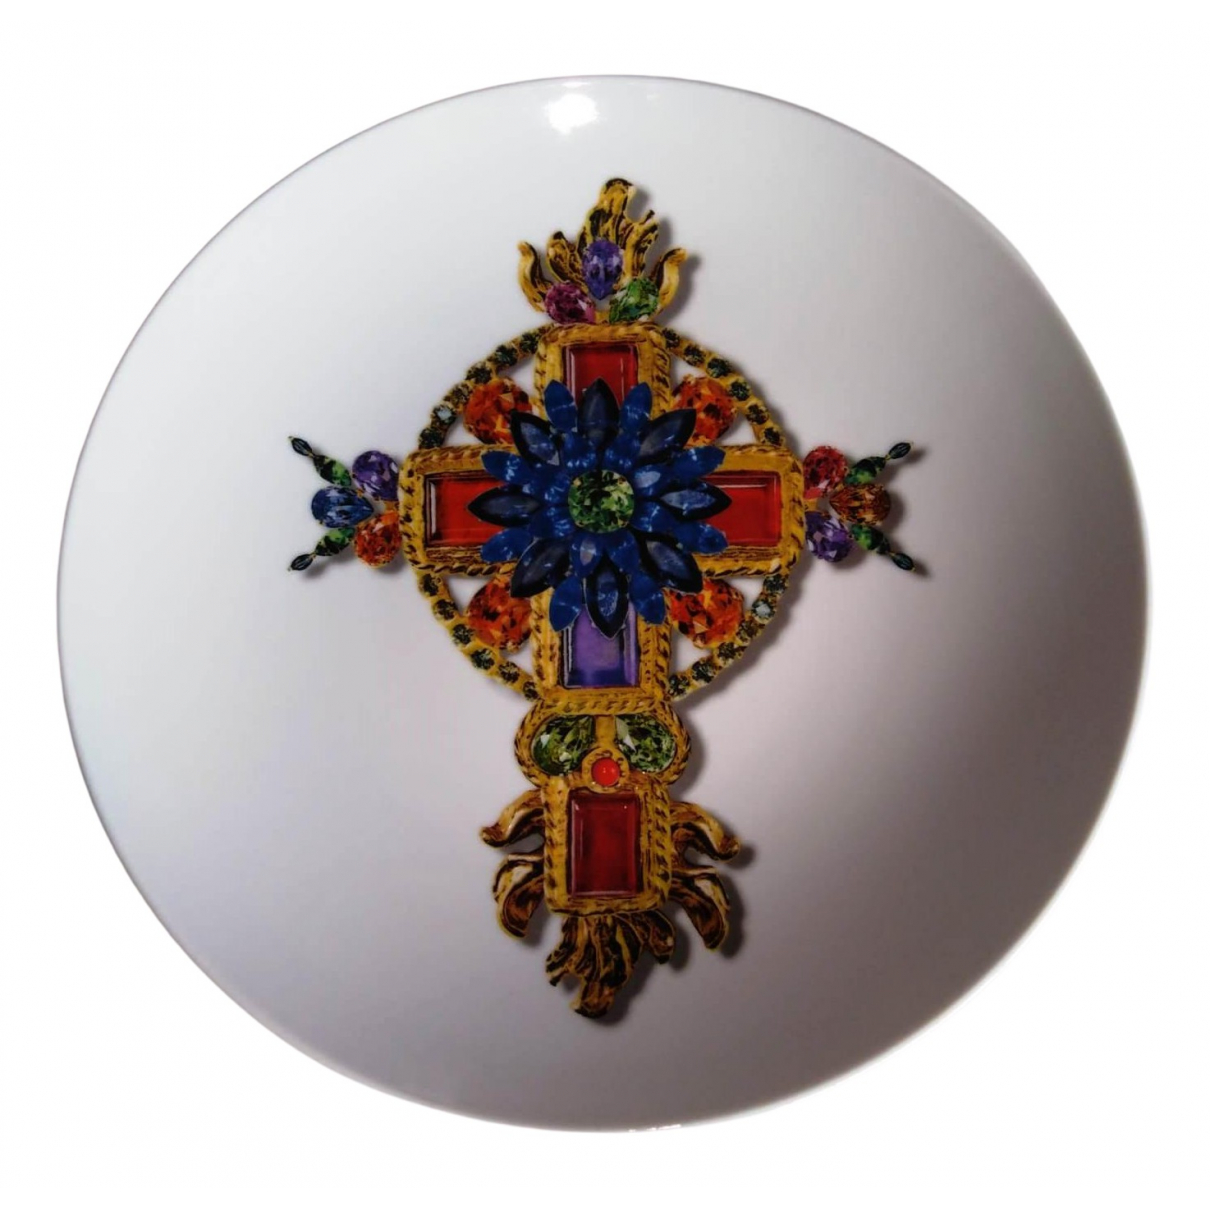 Christian Lacroix \N Tischkultur in  Bunt Keramik